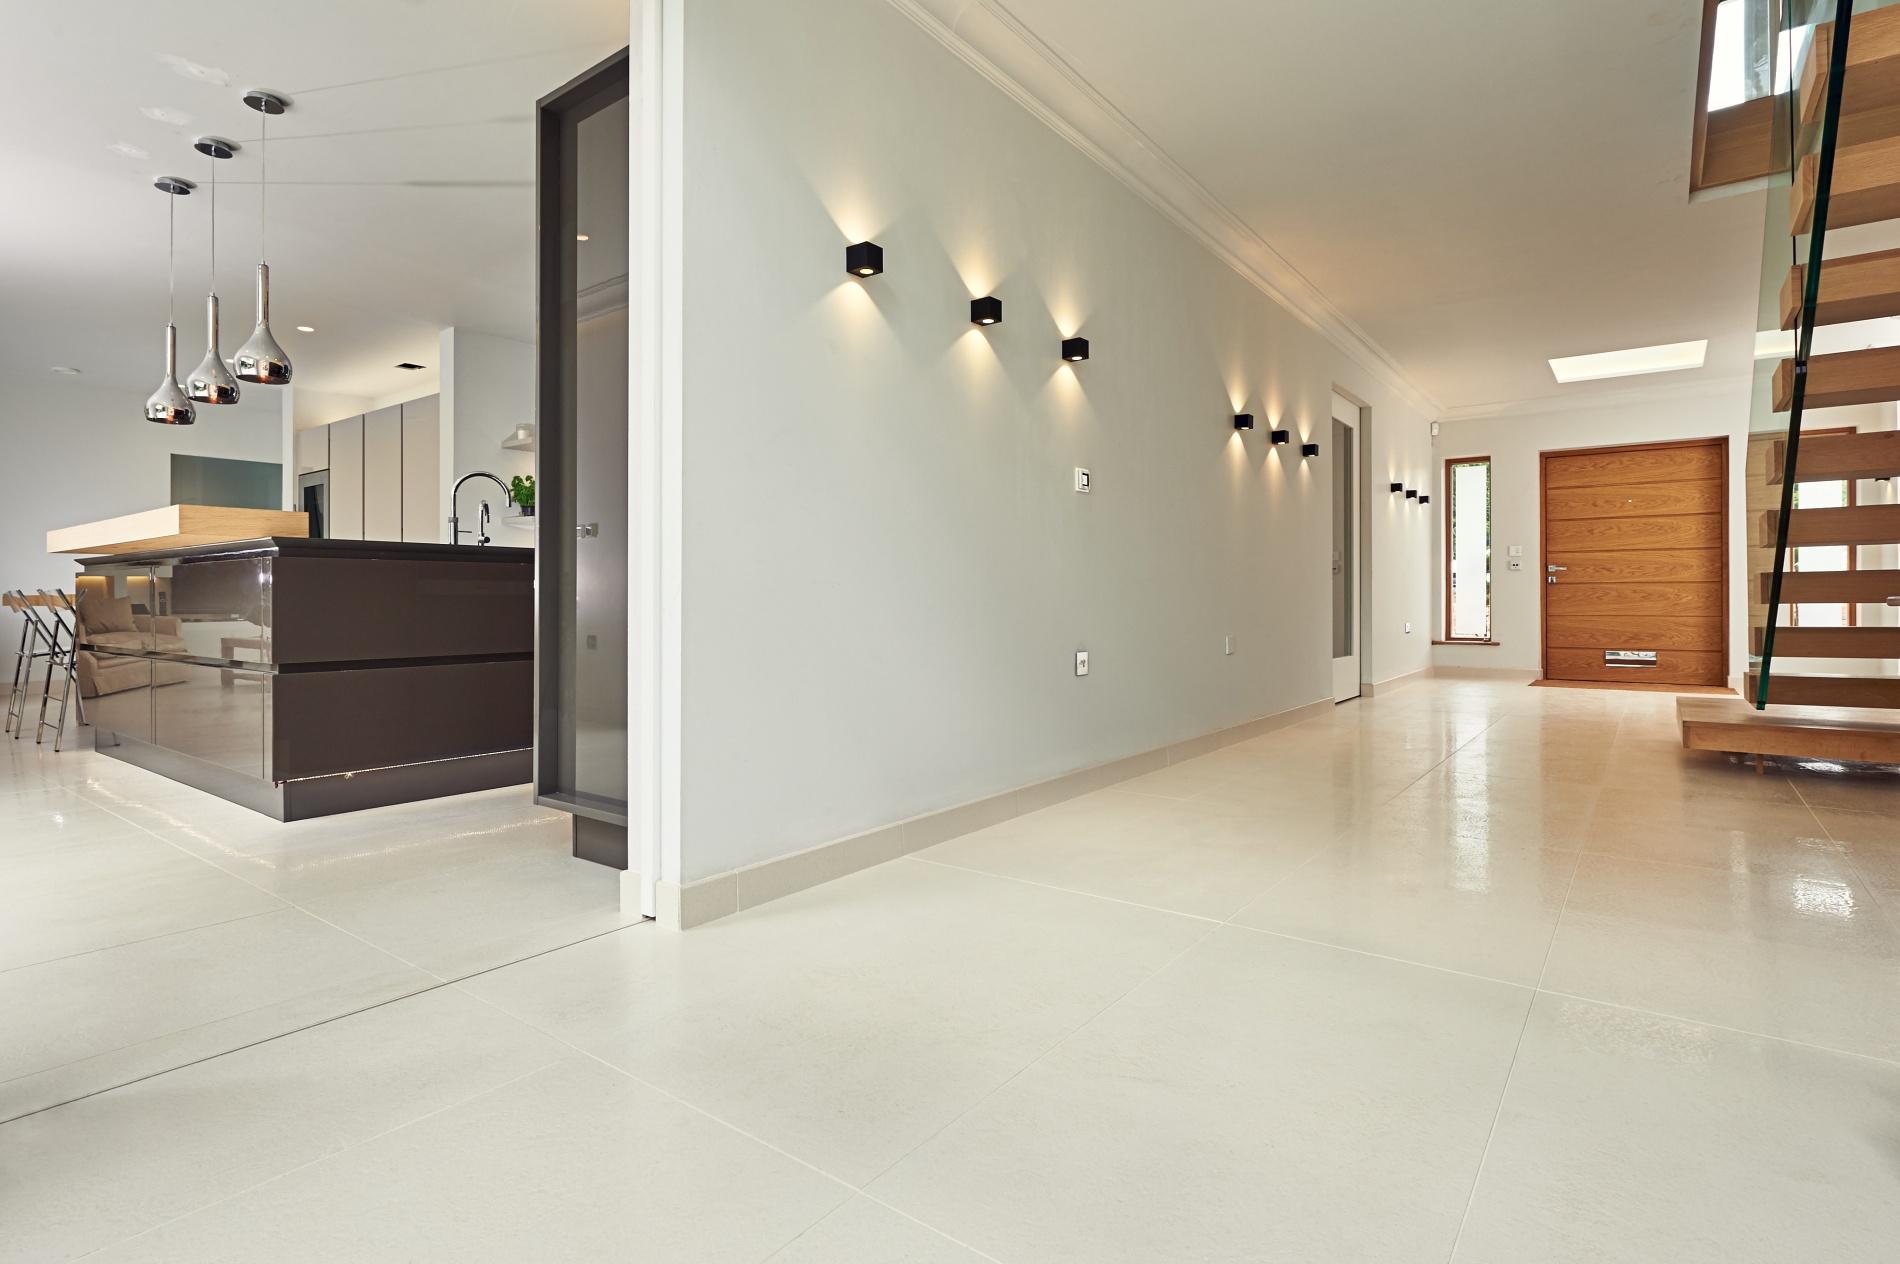 porcelain tile example: Infinito range high resolution photo